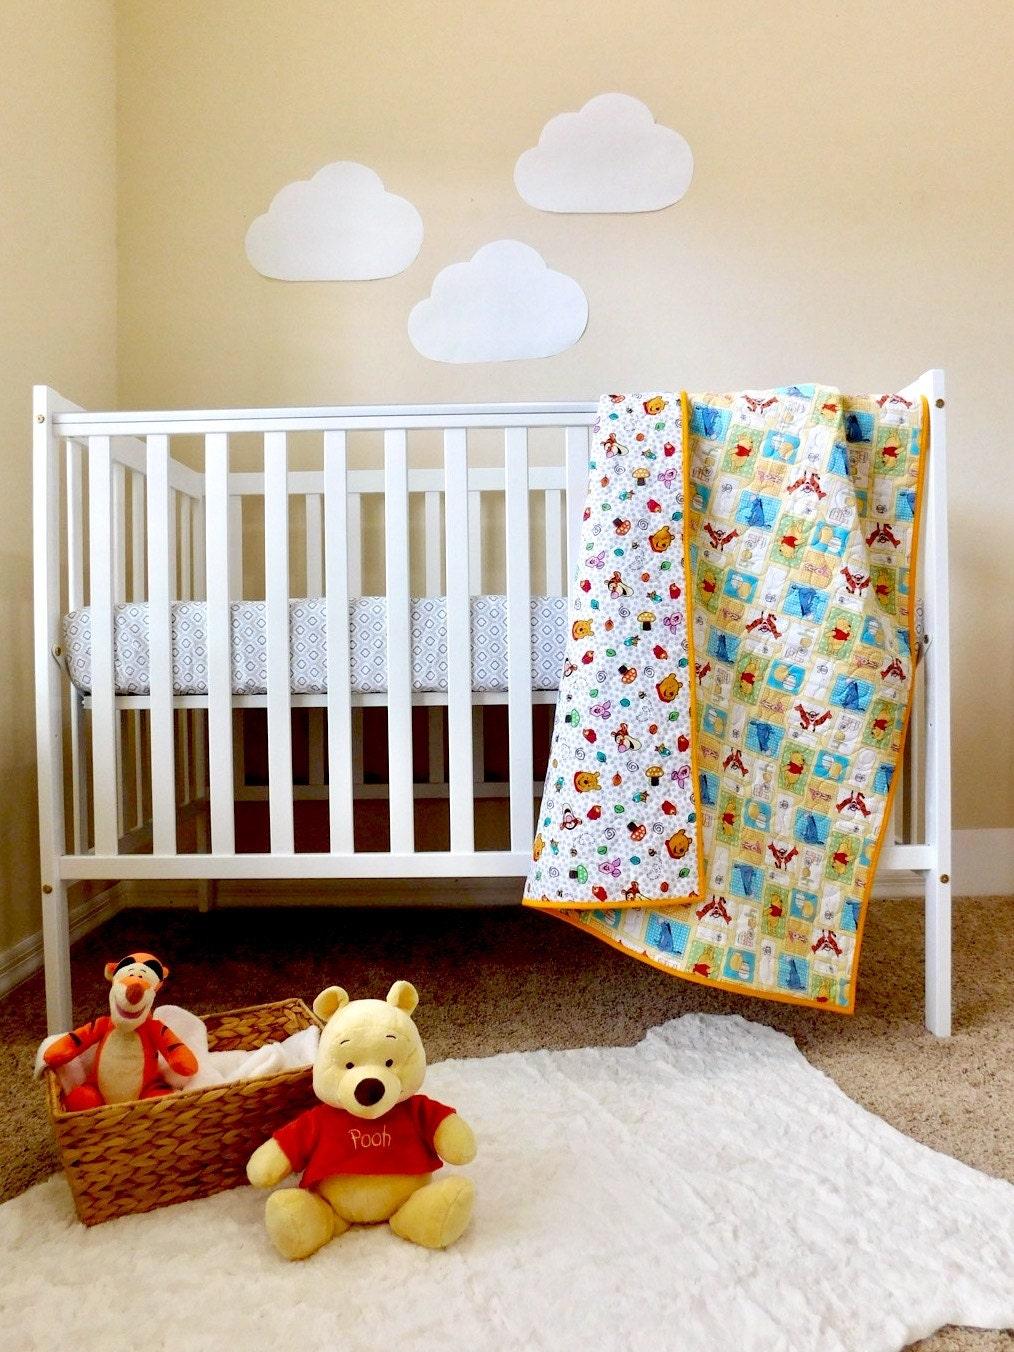 winnie the pooh baby quilt winnie the pooh nursery winnie. Black Bedroom Furniture Sets. Home Design Ideas